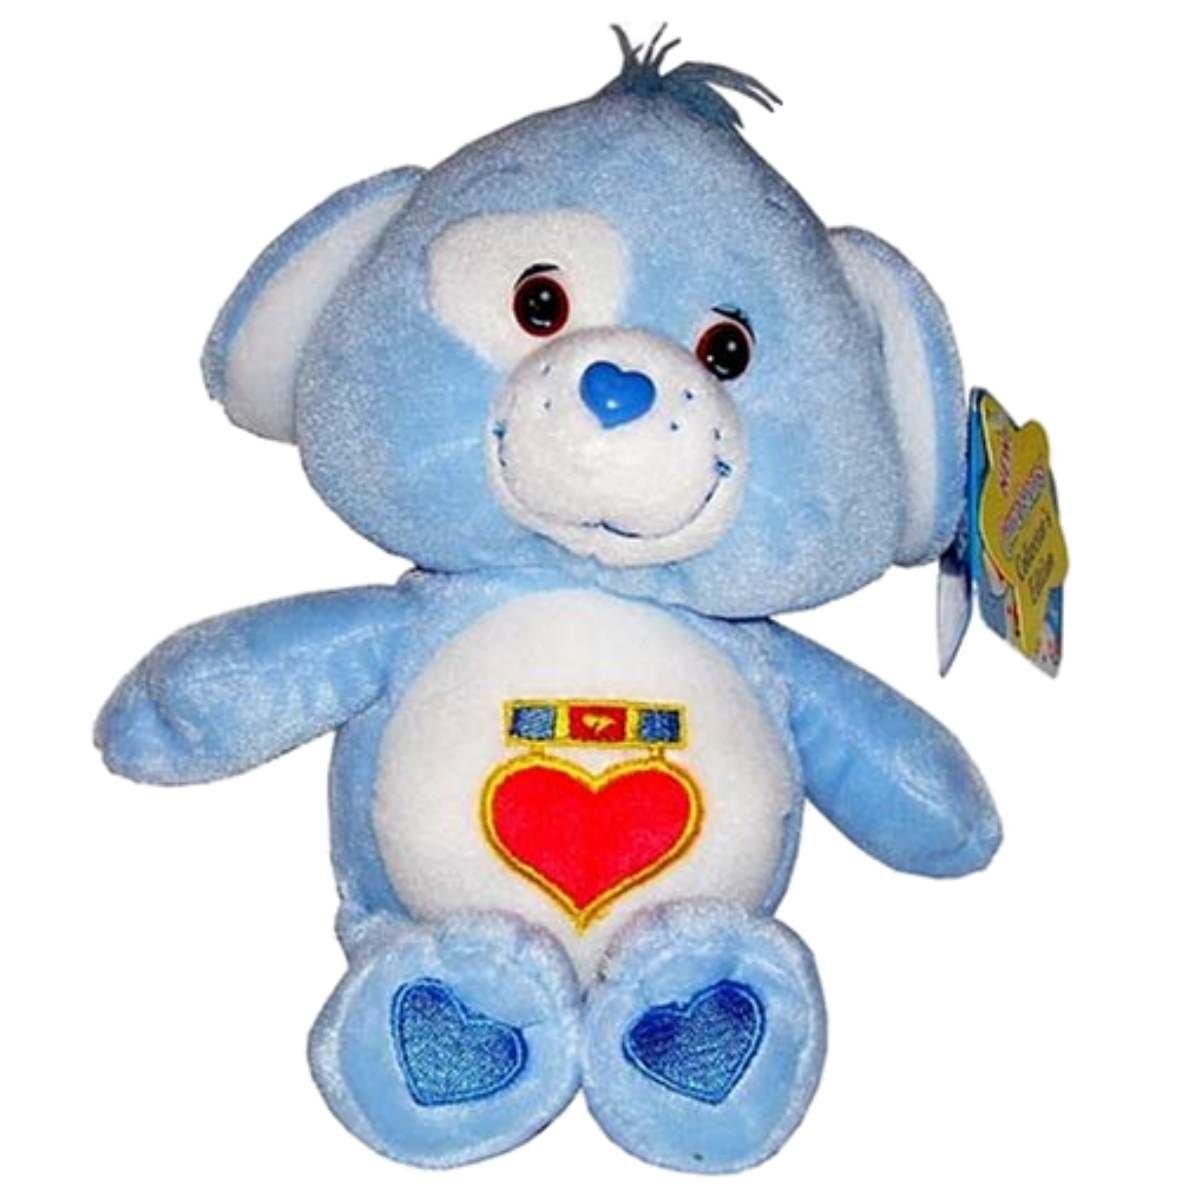 Entrega directa y rápida de fábrica Cochee Bears Cousins Loyal Heart Dog Dog Dog 8  Plush by Cochee Bears  barato